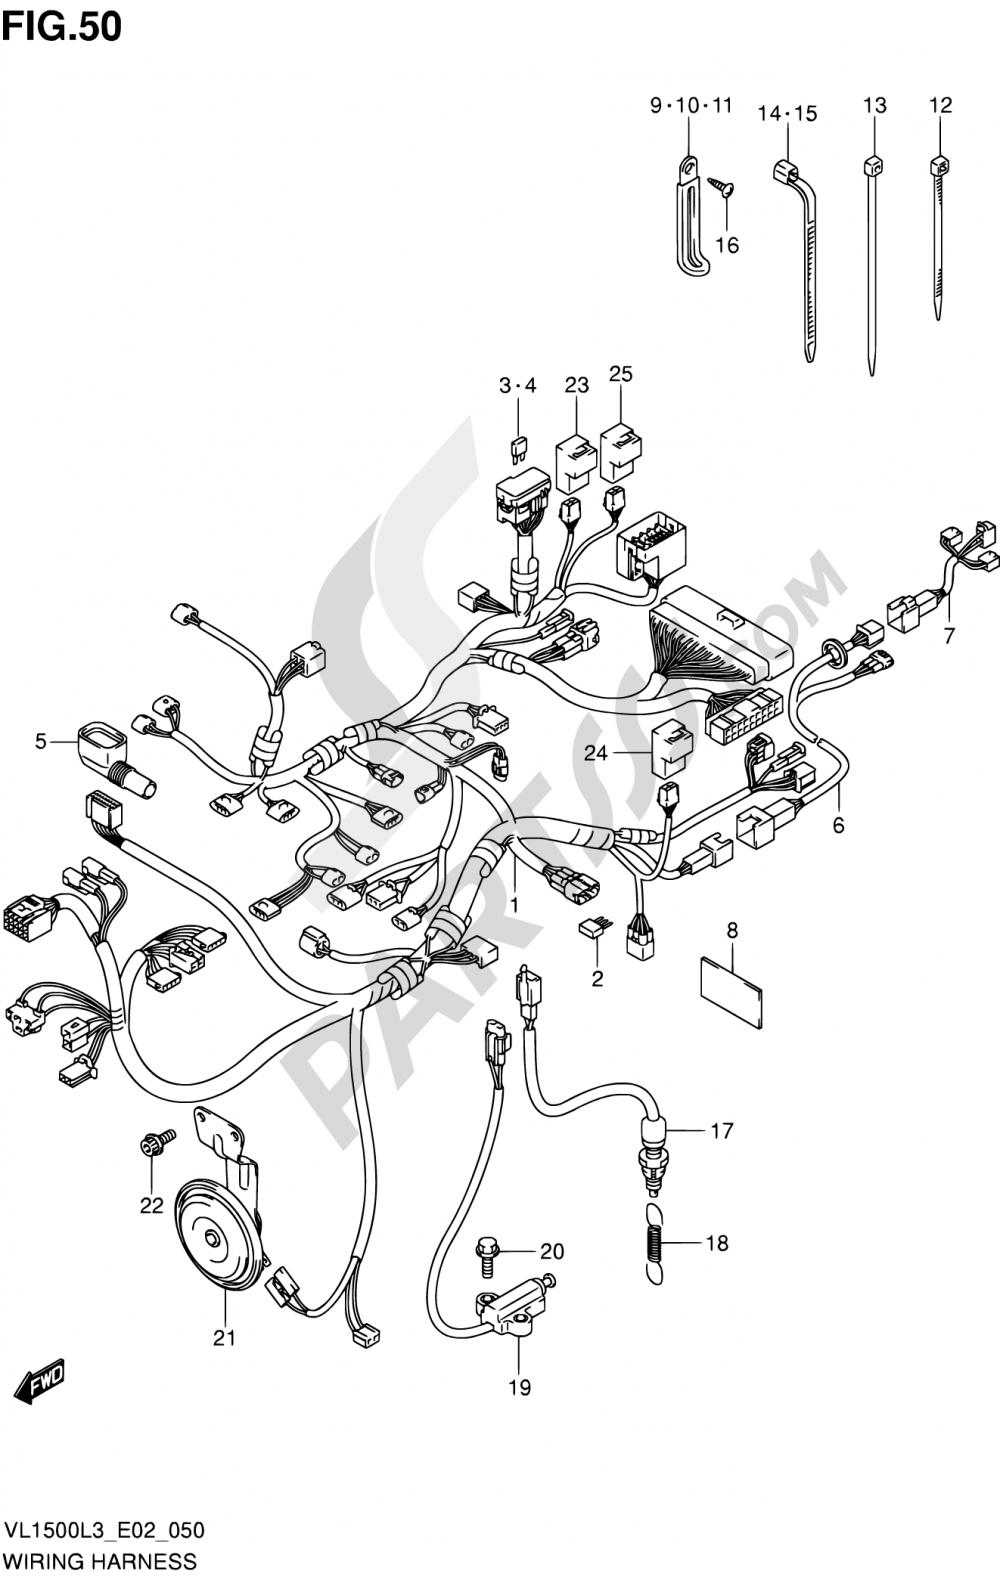 50 - WIRING HARNESS (VL1500L3 E02) Suzuki INTRUDER VL150 2013